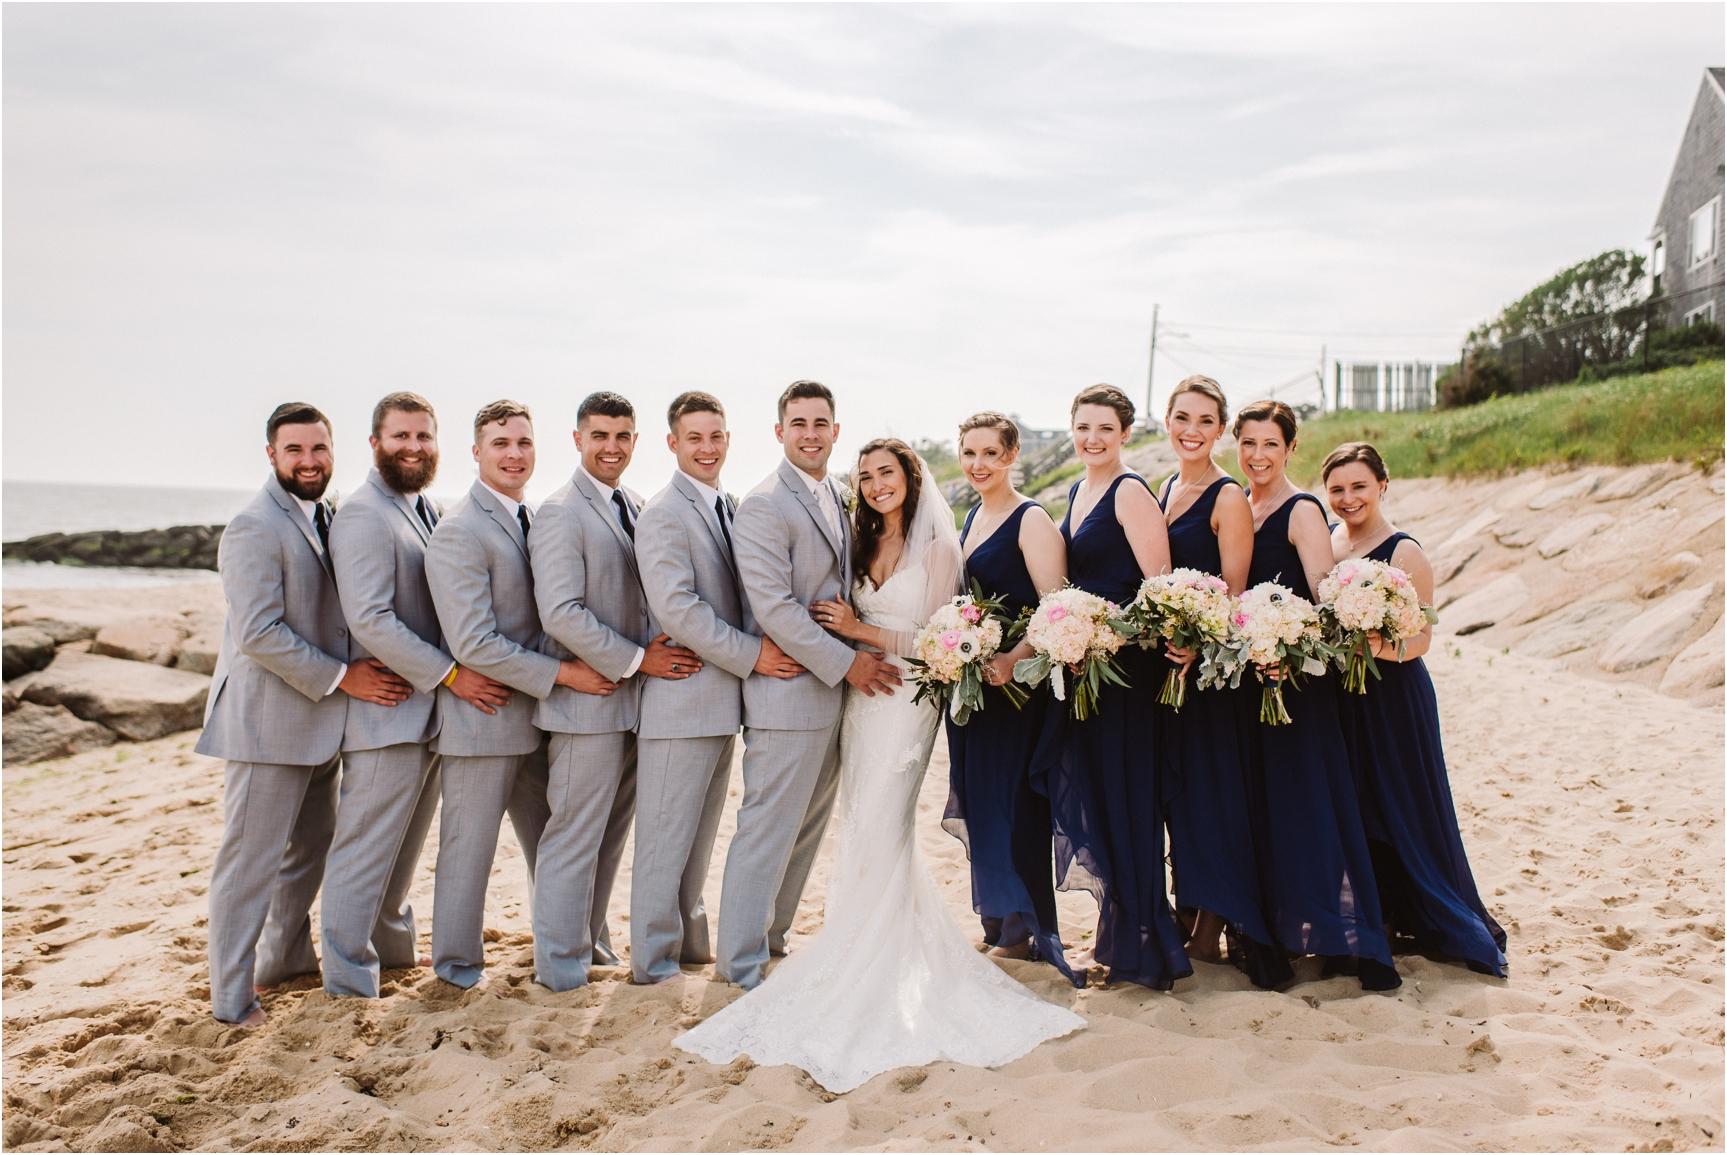 Sarah & Sam Pelham House Cape Cod Wedding Photographer-117.jpg